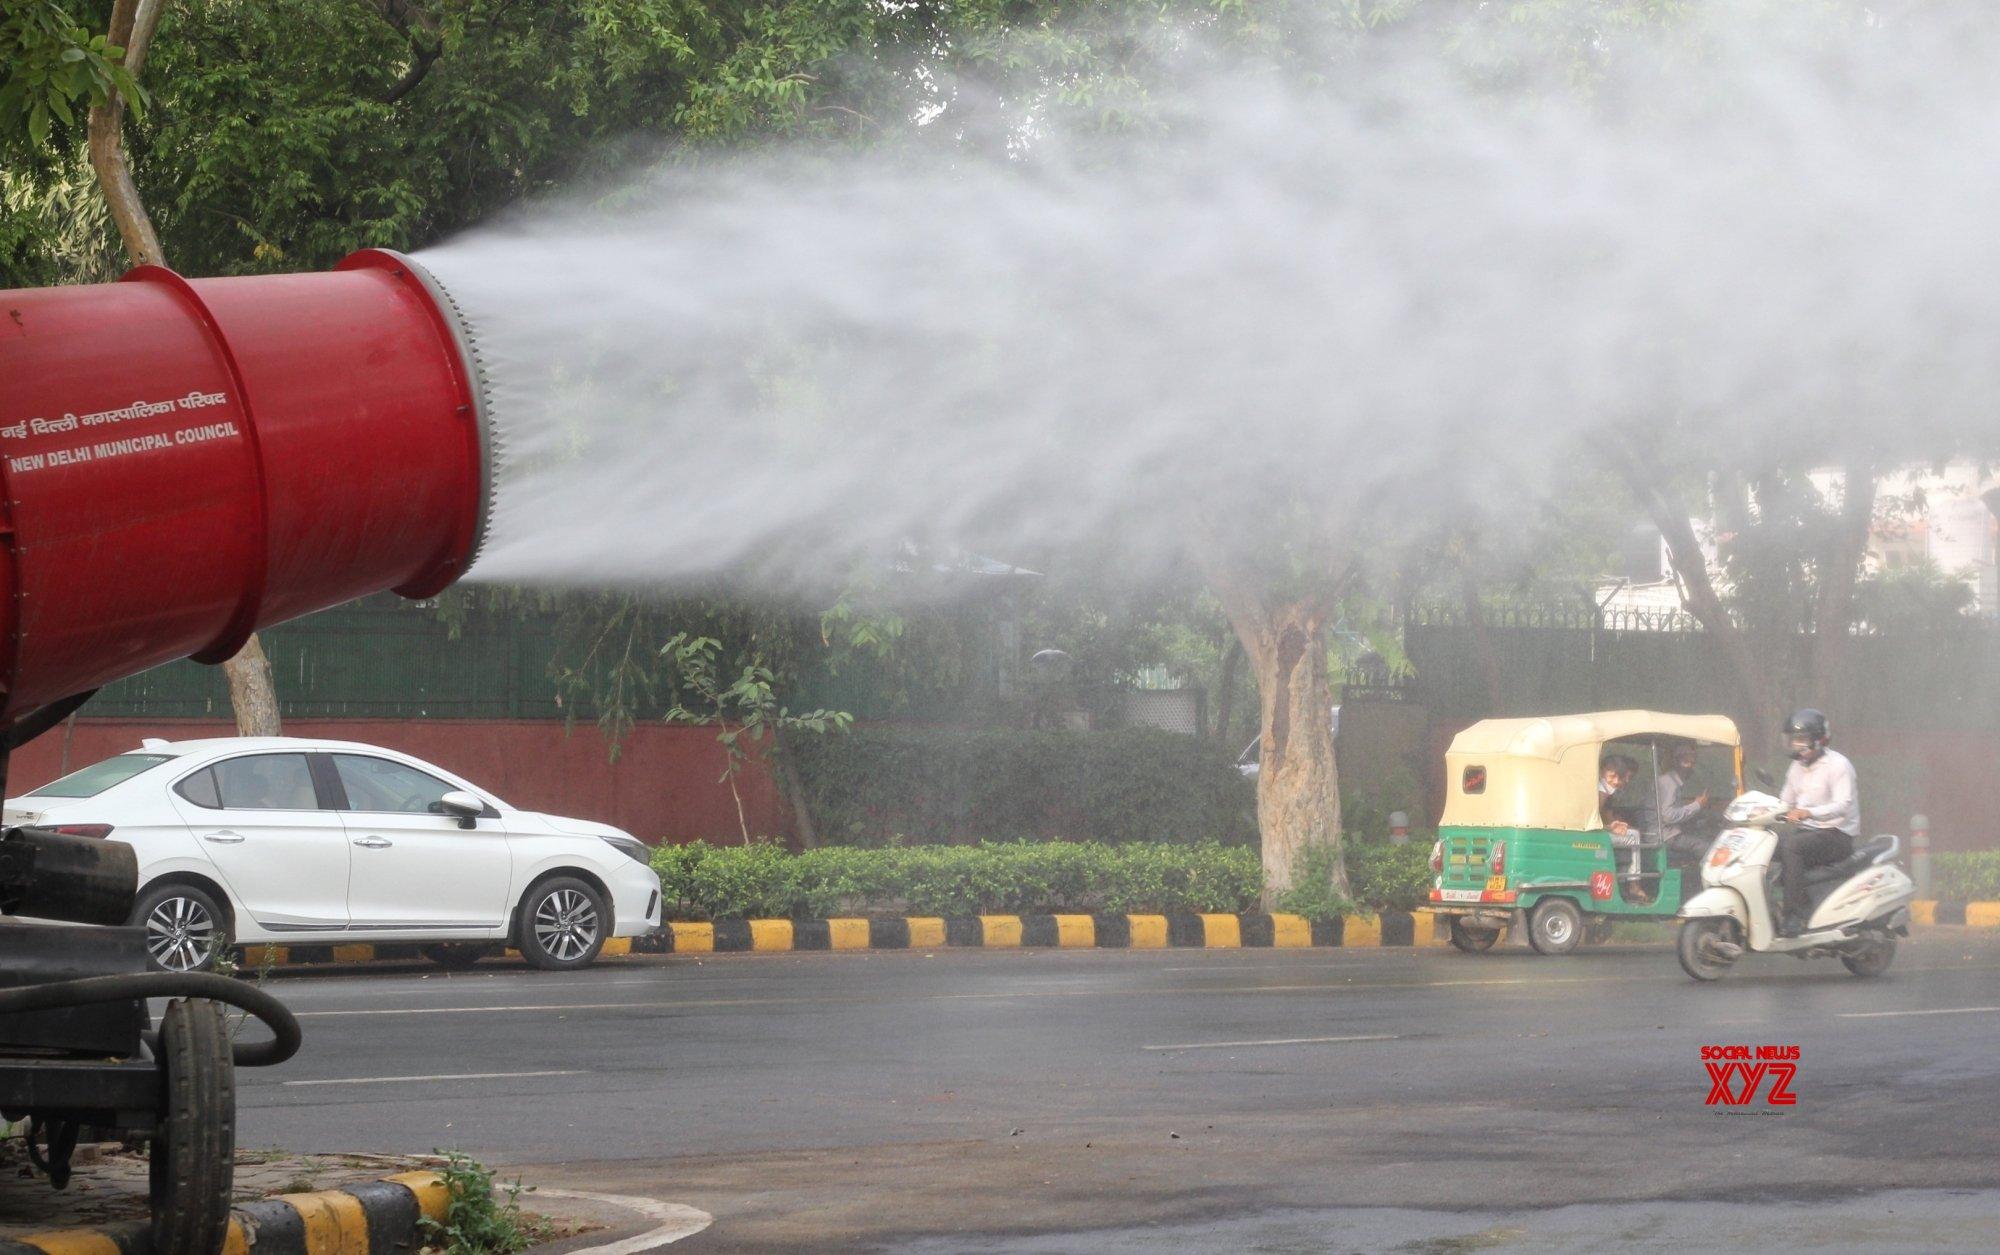 New Delhi: New Delhi Municipal Council (NDMC) installed Anti Smog Gun for senitizing at Mahadev Road in New Delhi. #Gallery